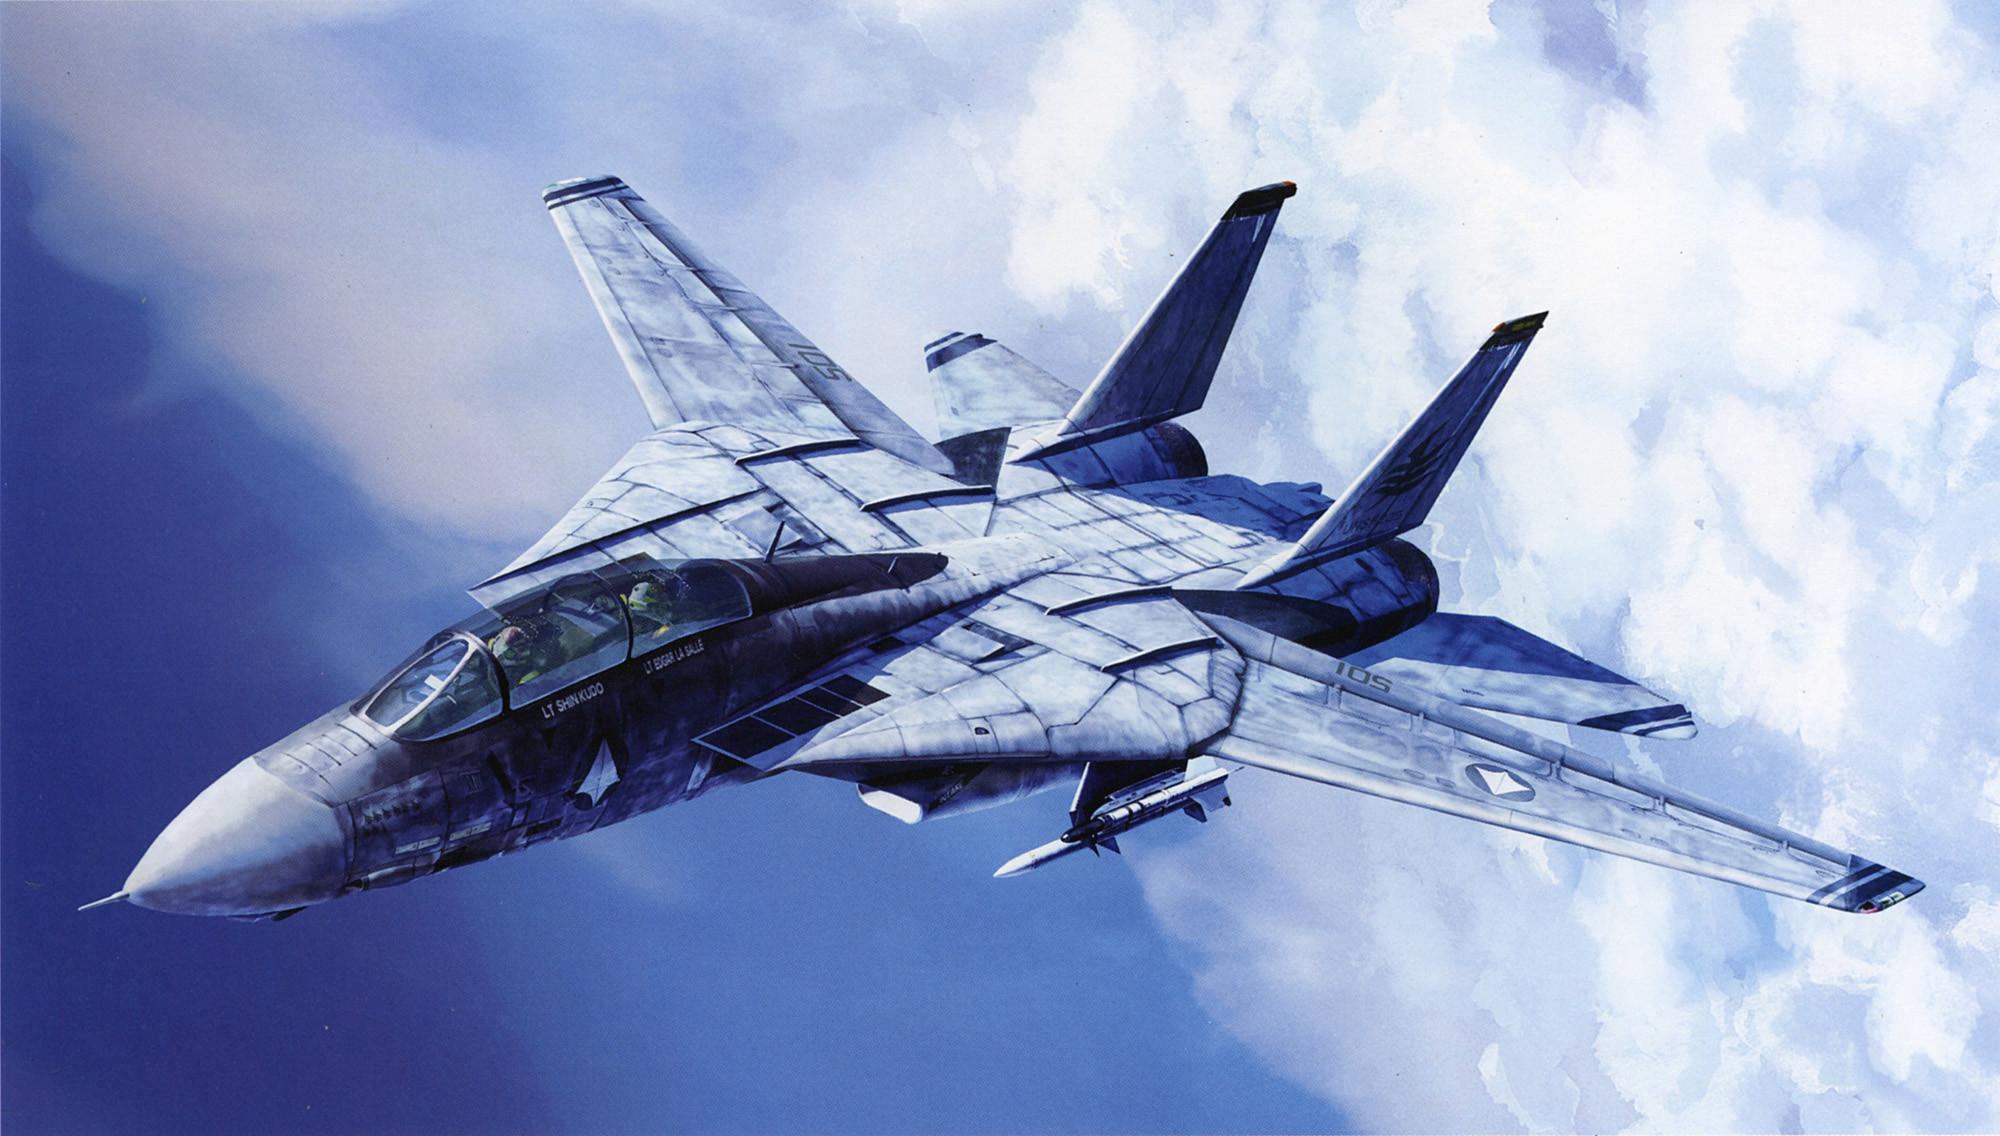 Res: 2000x1136, aircraft, Macross, artwork, vehicles, skyscapes, Grumman F14 Tomcat - Free  Wallpaper / WallpaperJam.com